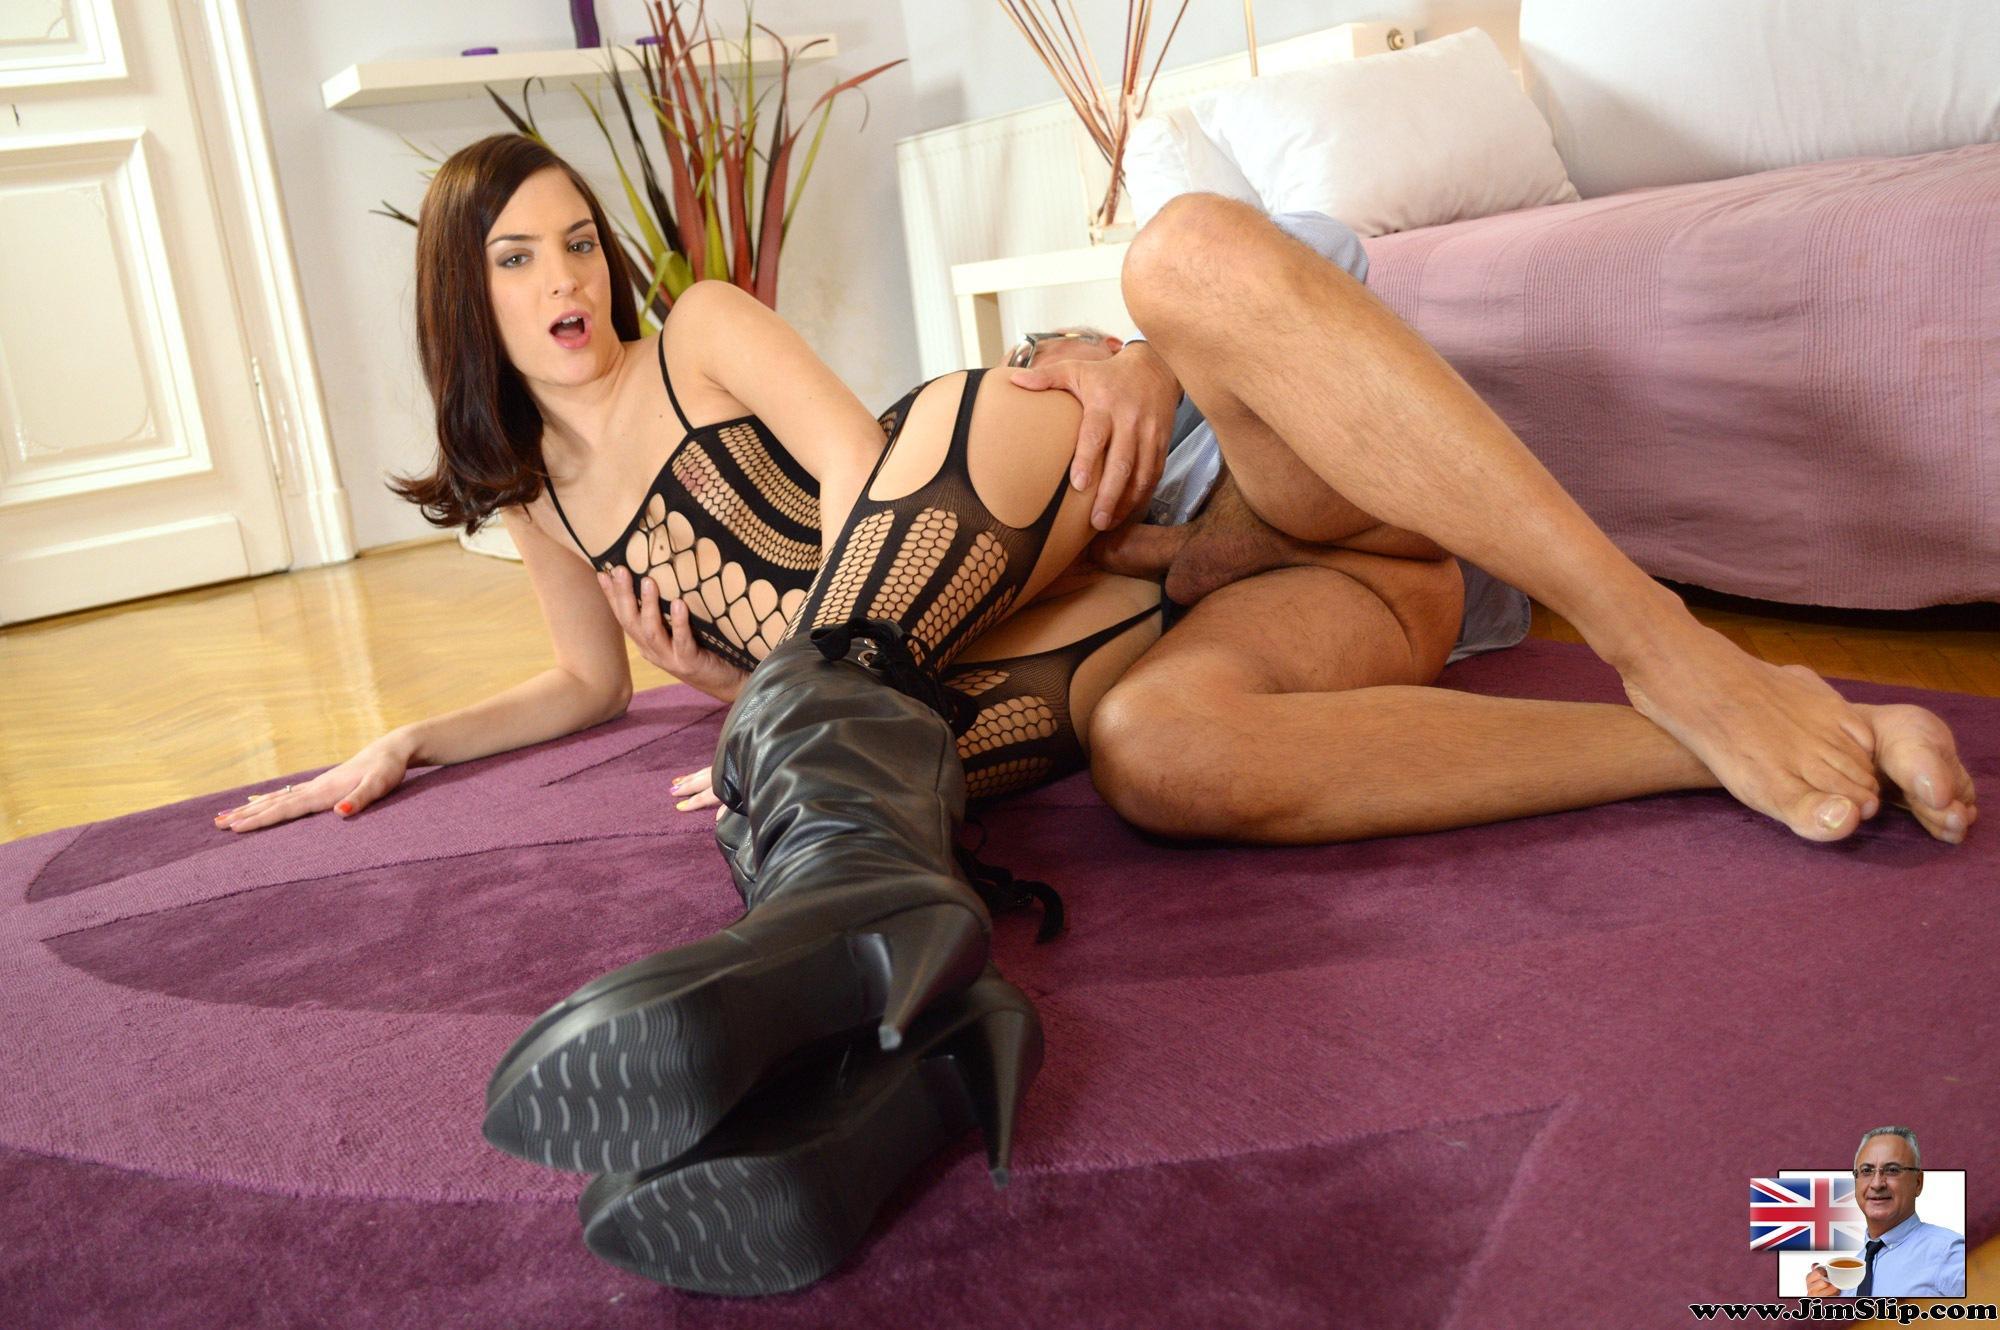 UK slut wearing Ripped Stockings is so horny